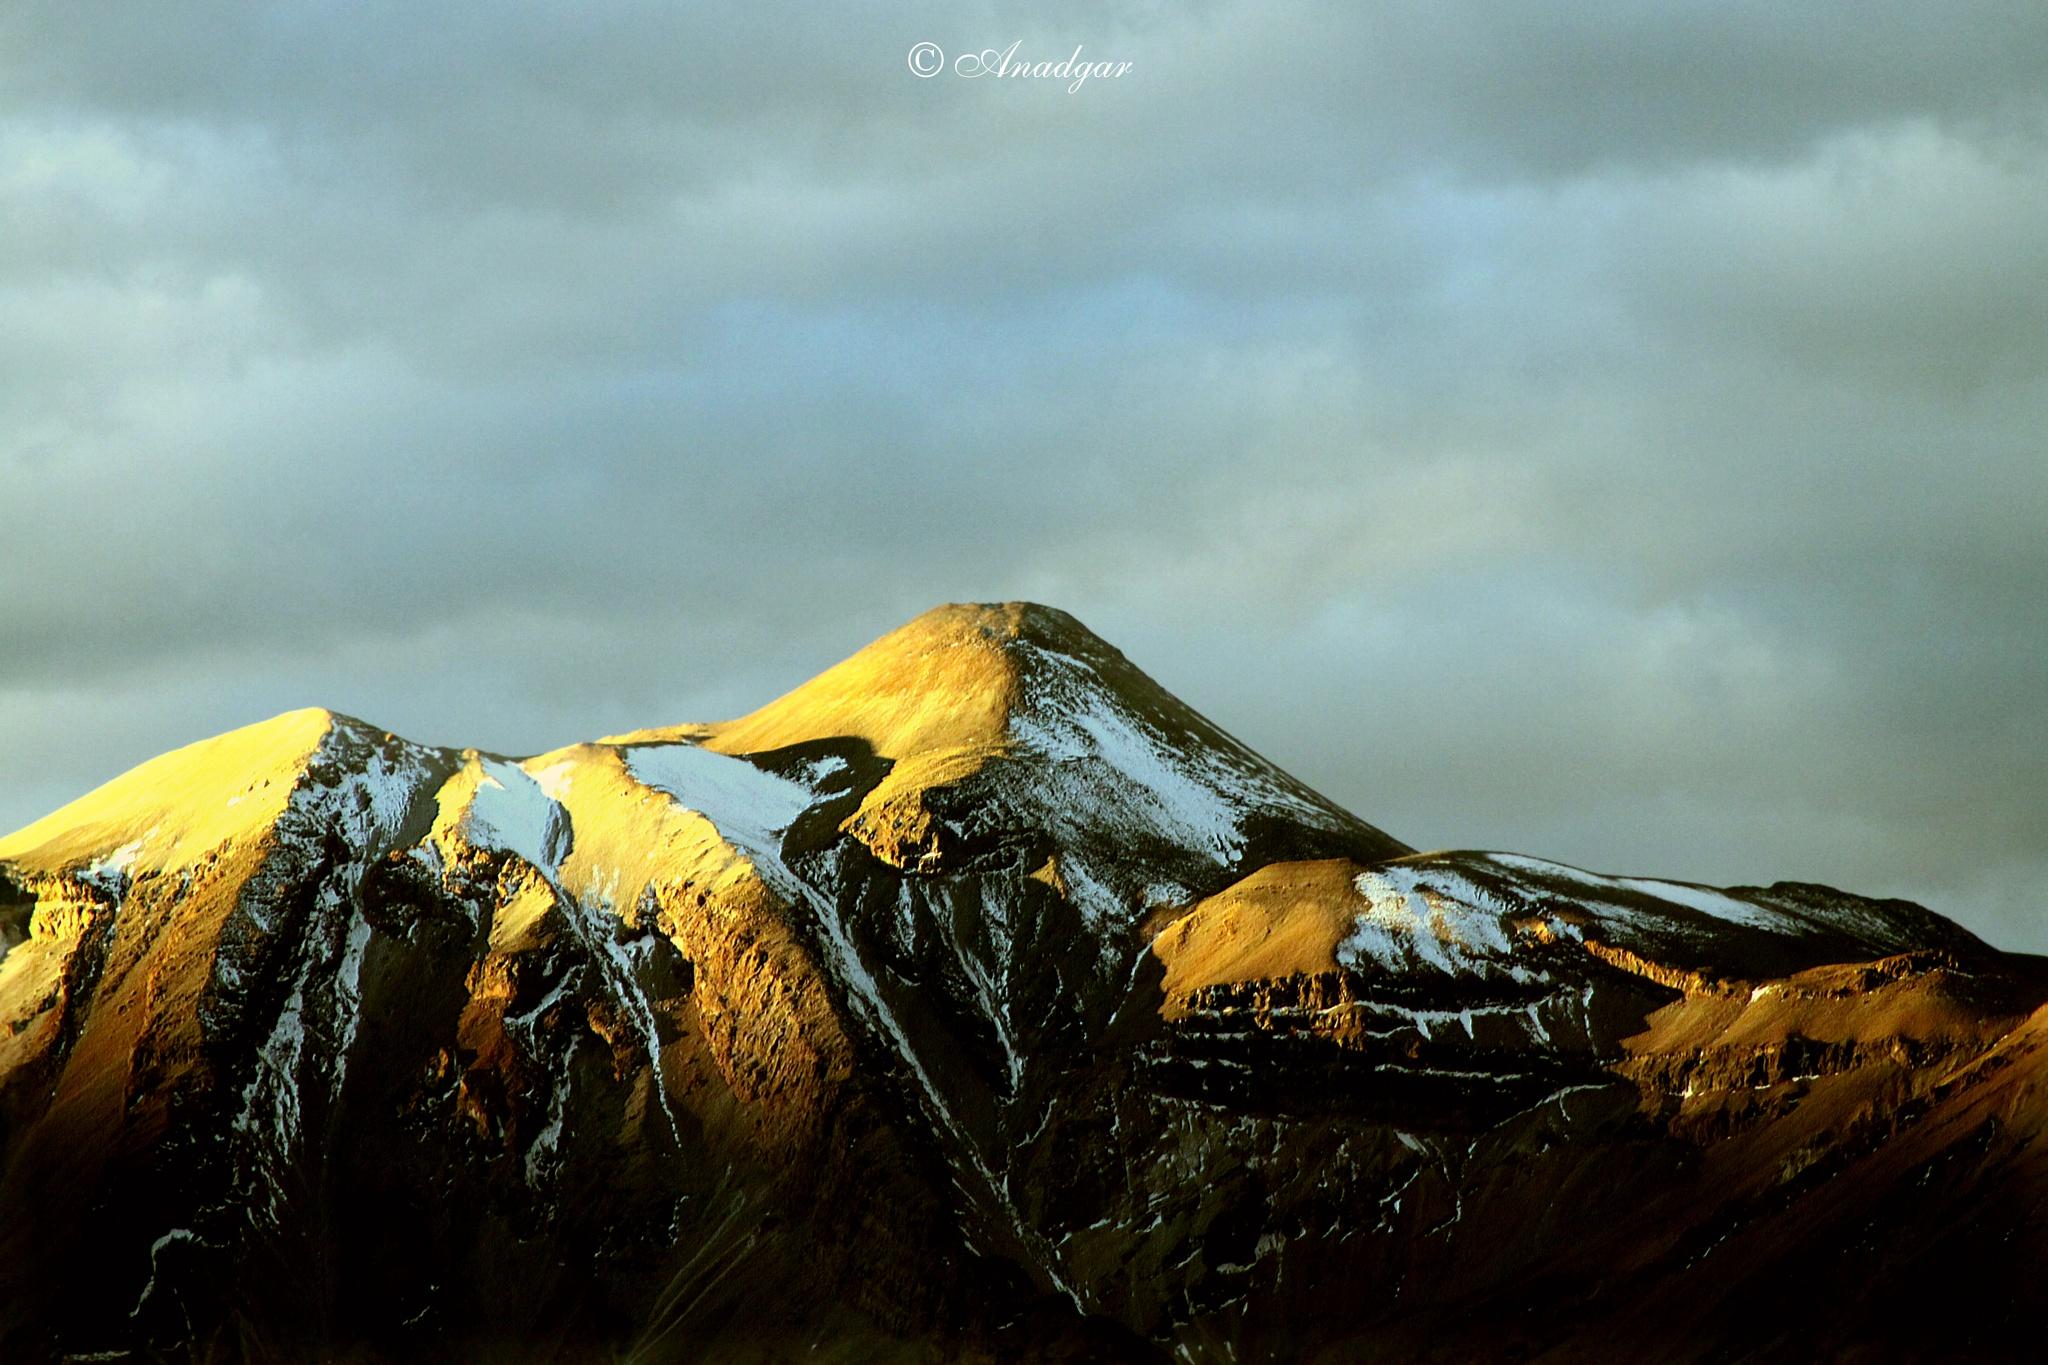 Volcan Paniri by Anadgar03